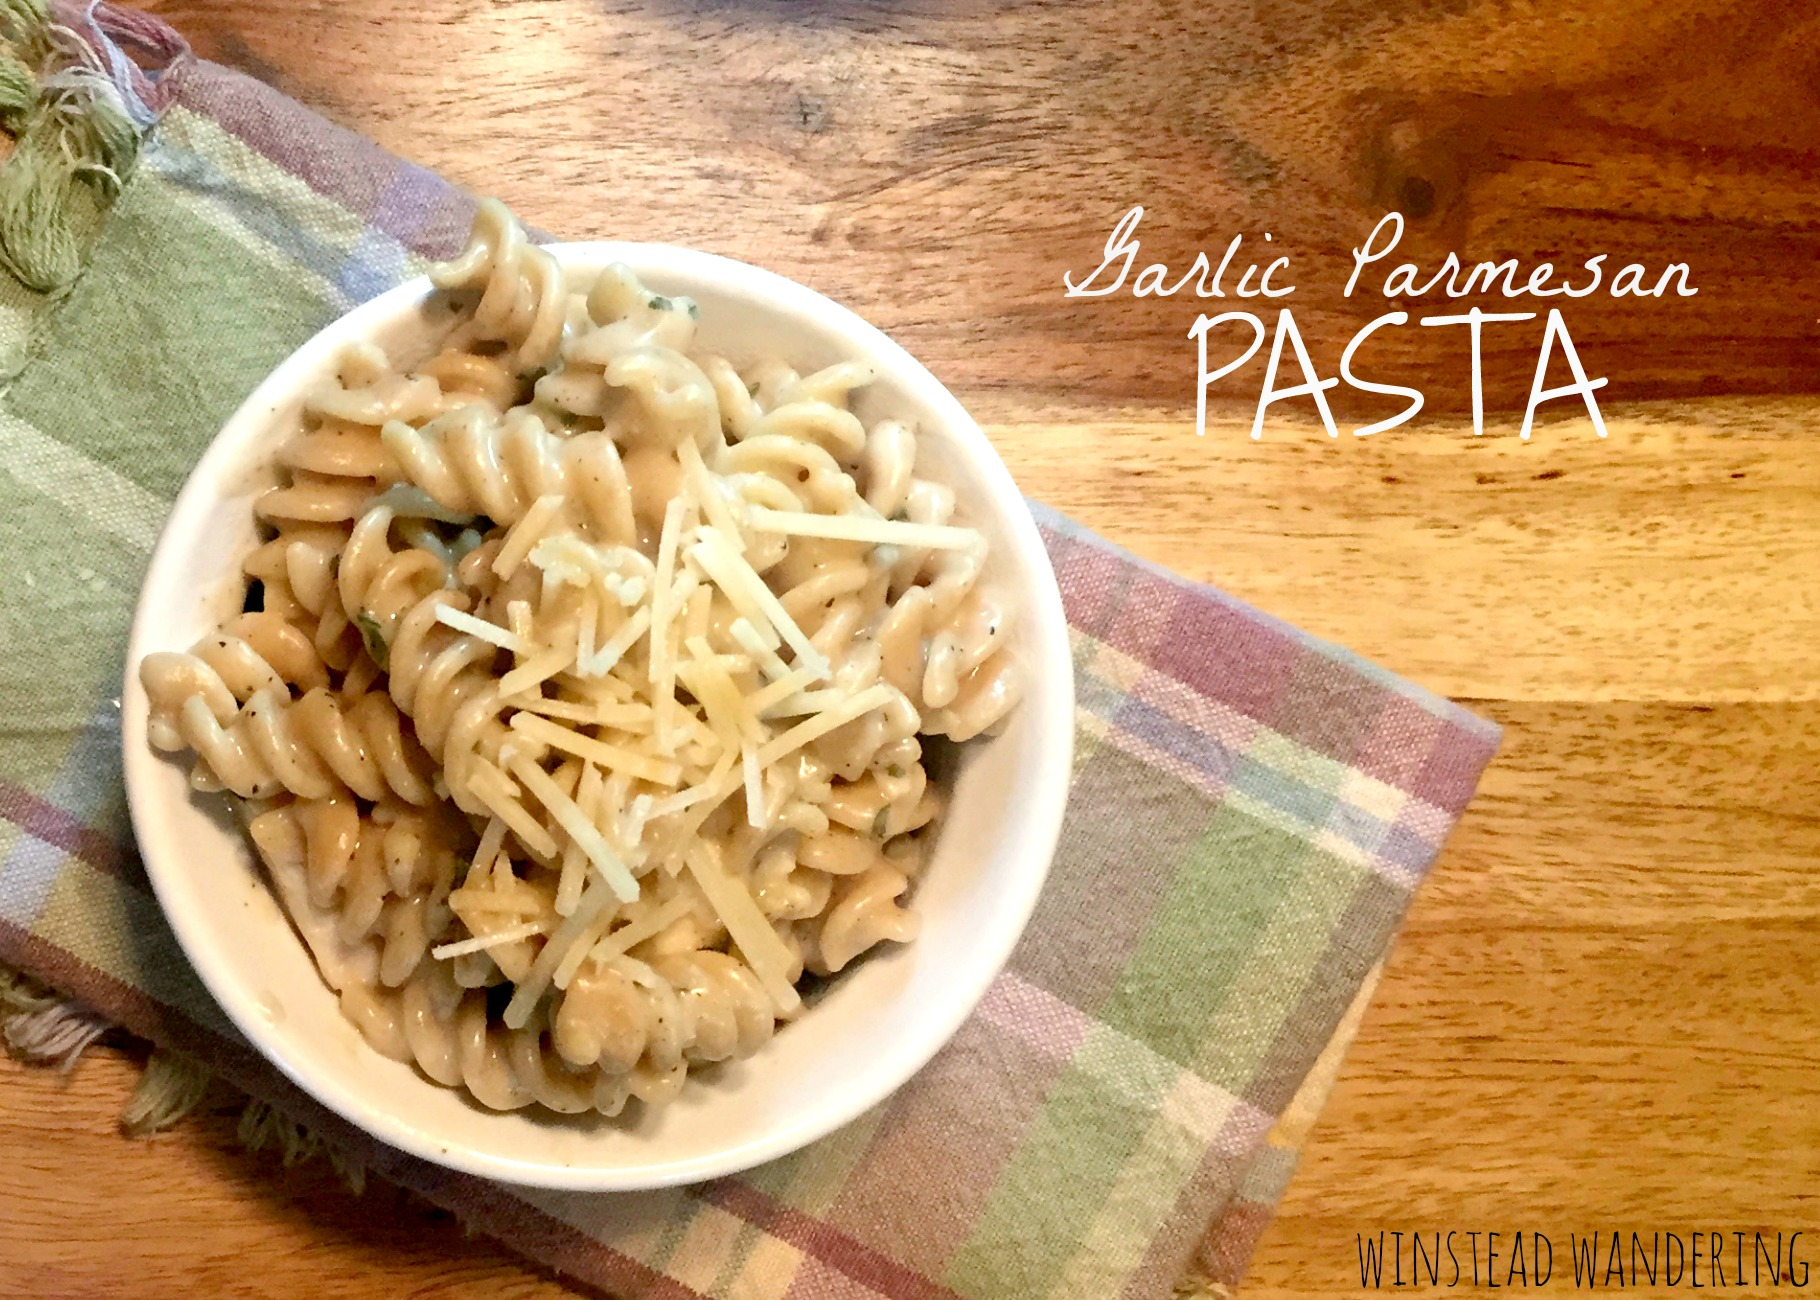 garlic parmesan pasta recipe | winstead wandering